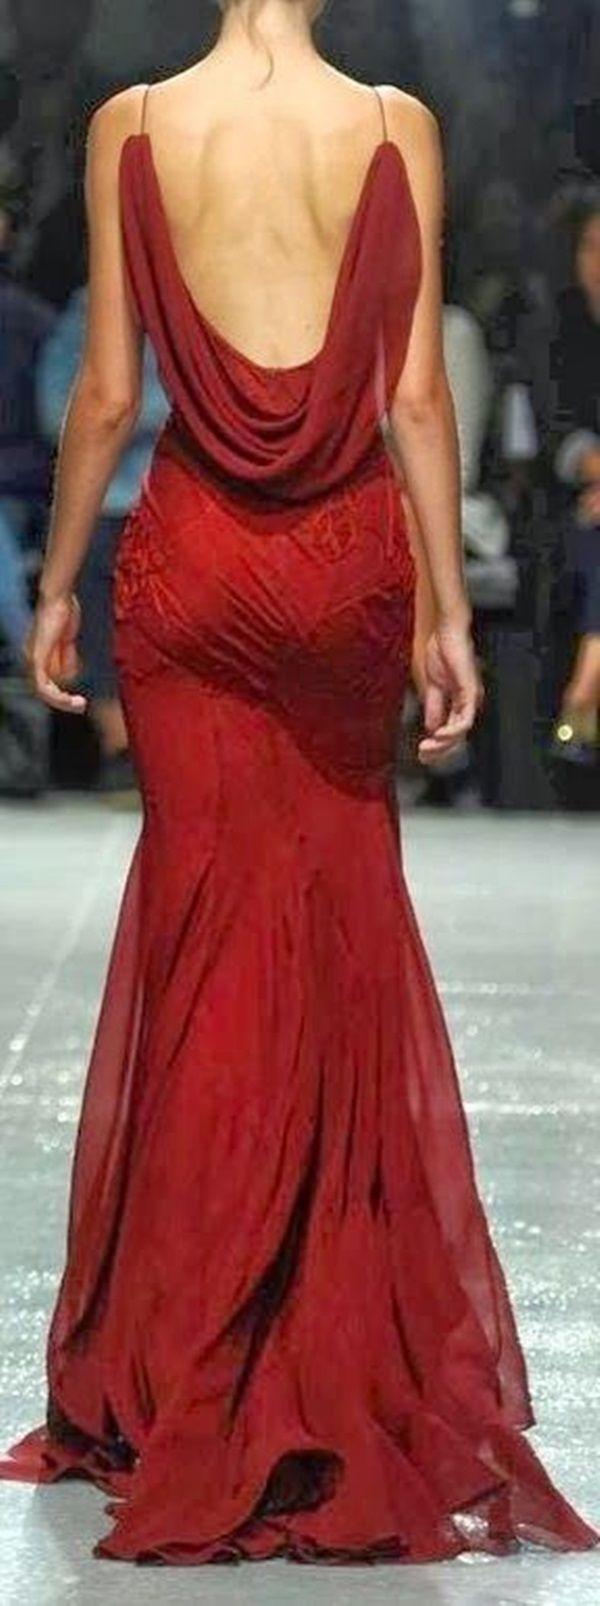 Sexy Backless Dress (14)